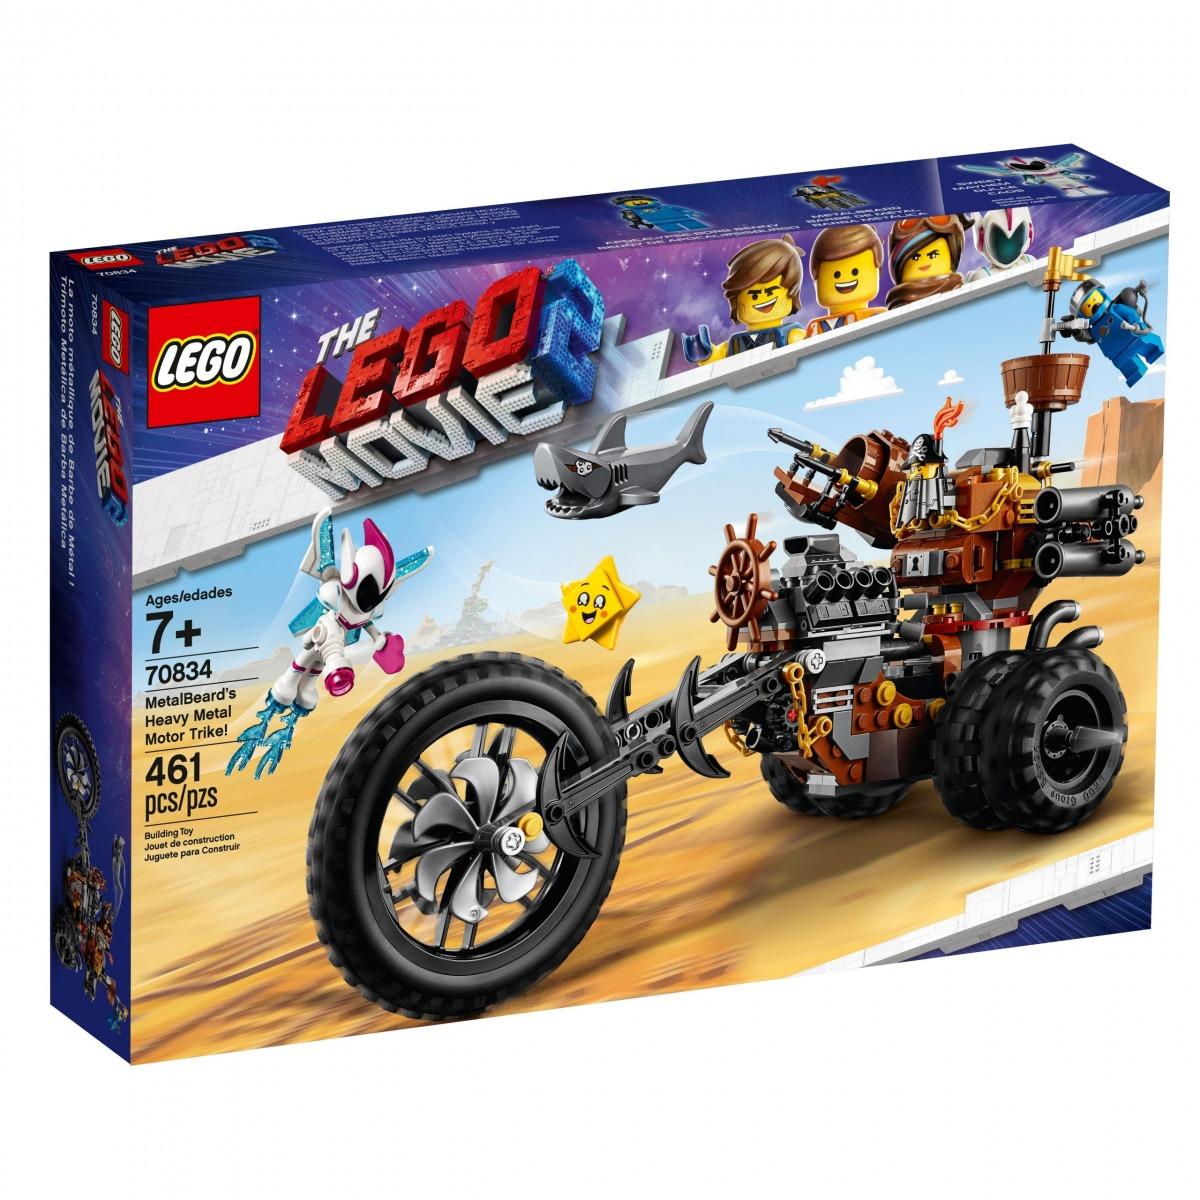 lego 70834 metallskaggets heavy metal trike scaled